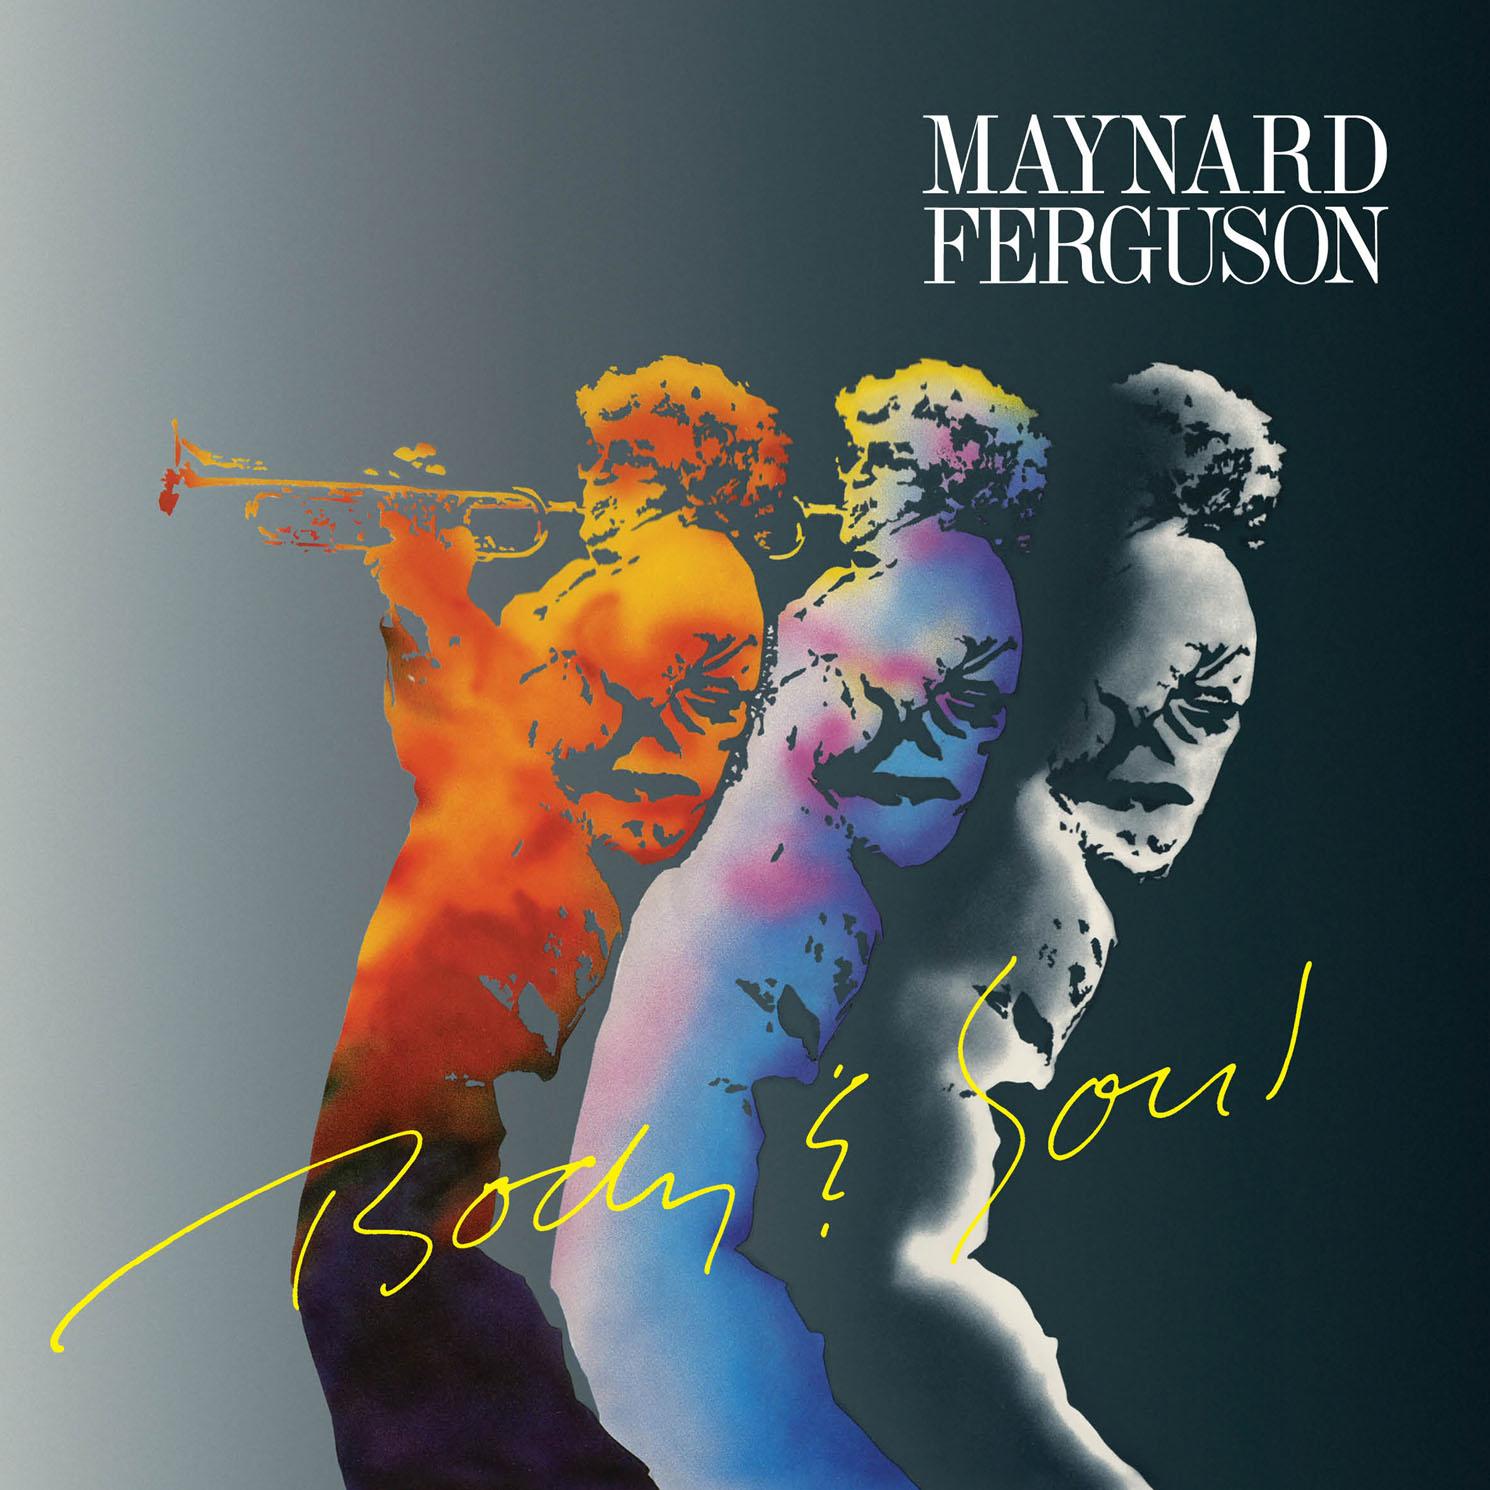 Maynard Ferguson - Body & Soul  Release Date: March 11, 2016 Label: Omnivore Recordings  SERVICE: Mastering NUMBER OF DISCS: 1 GENRE: Jazz FORMAT: CD   TRAILER